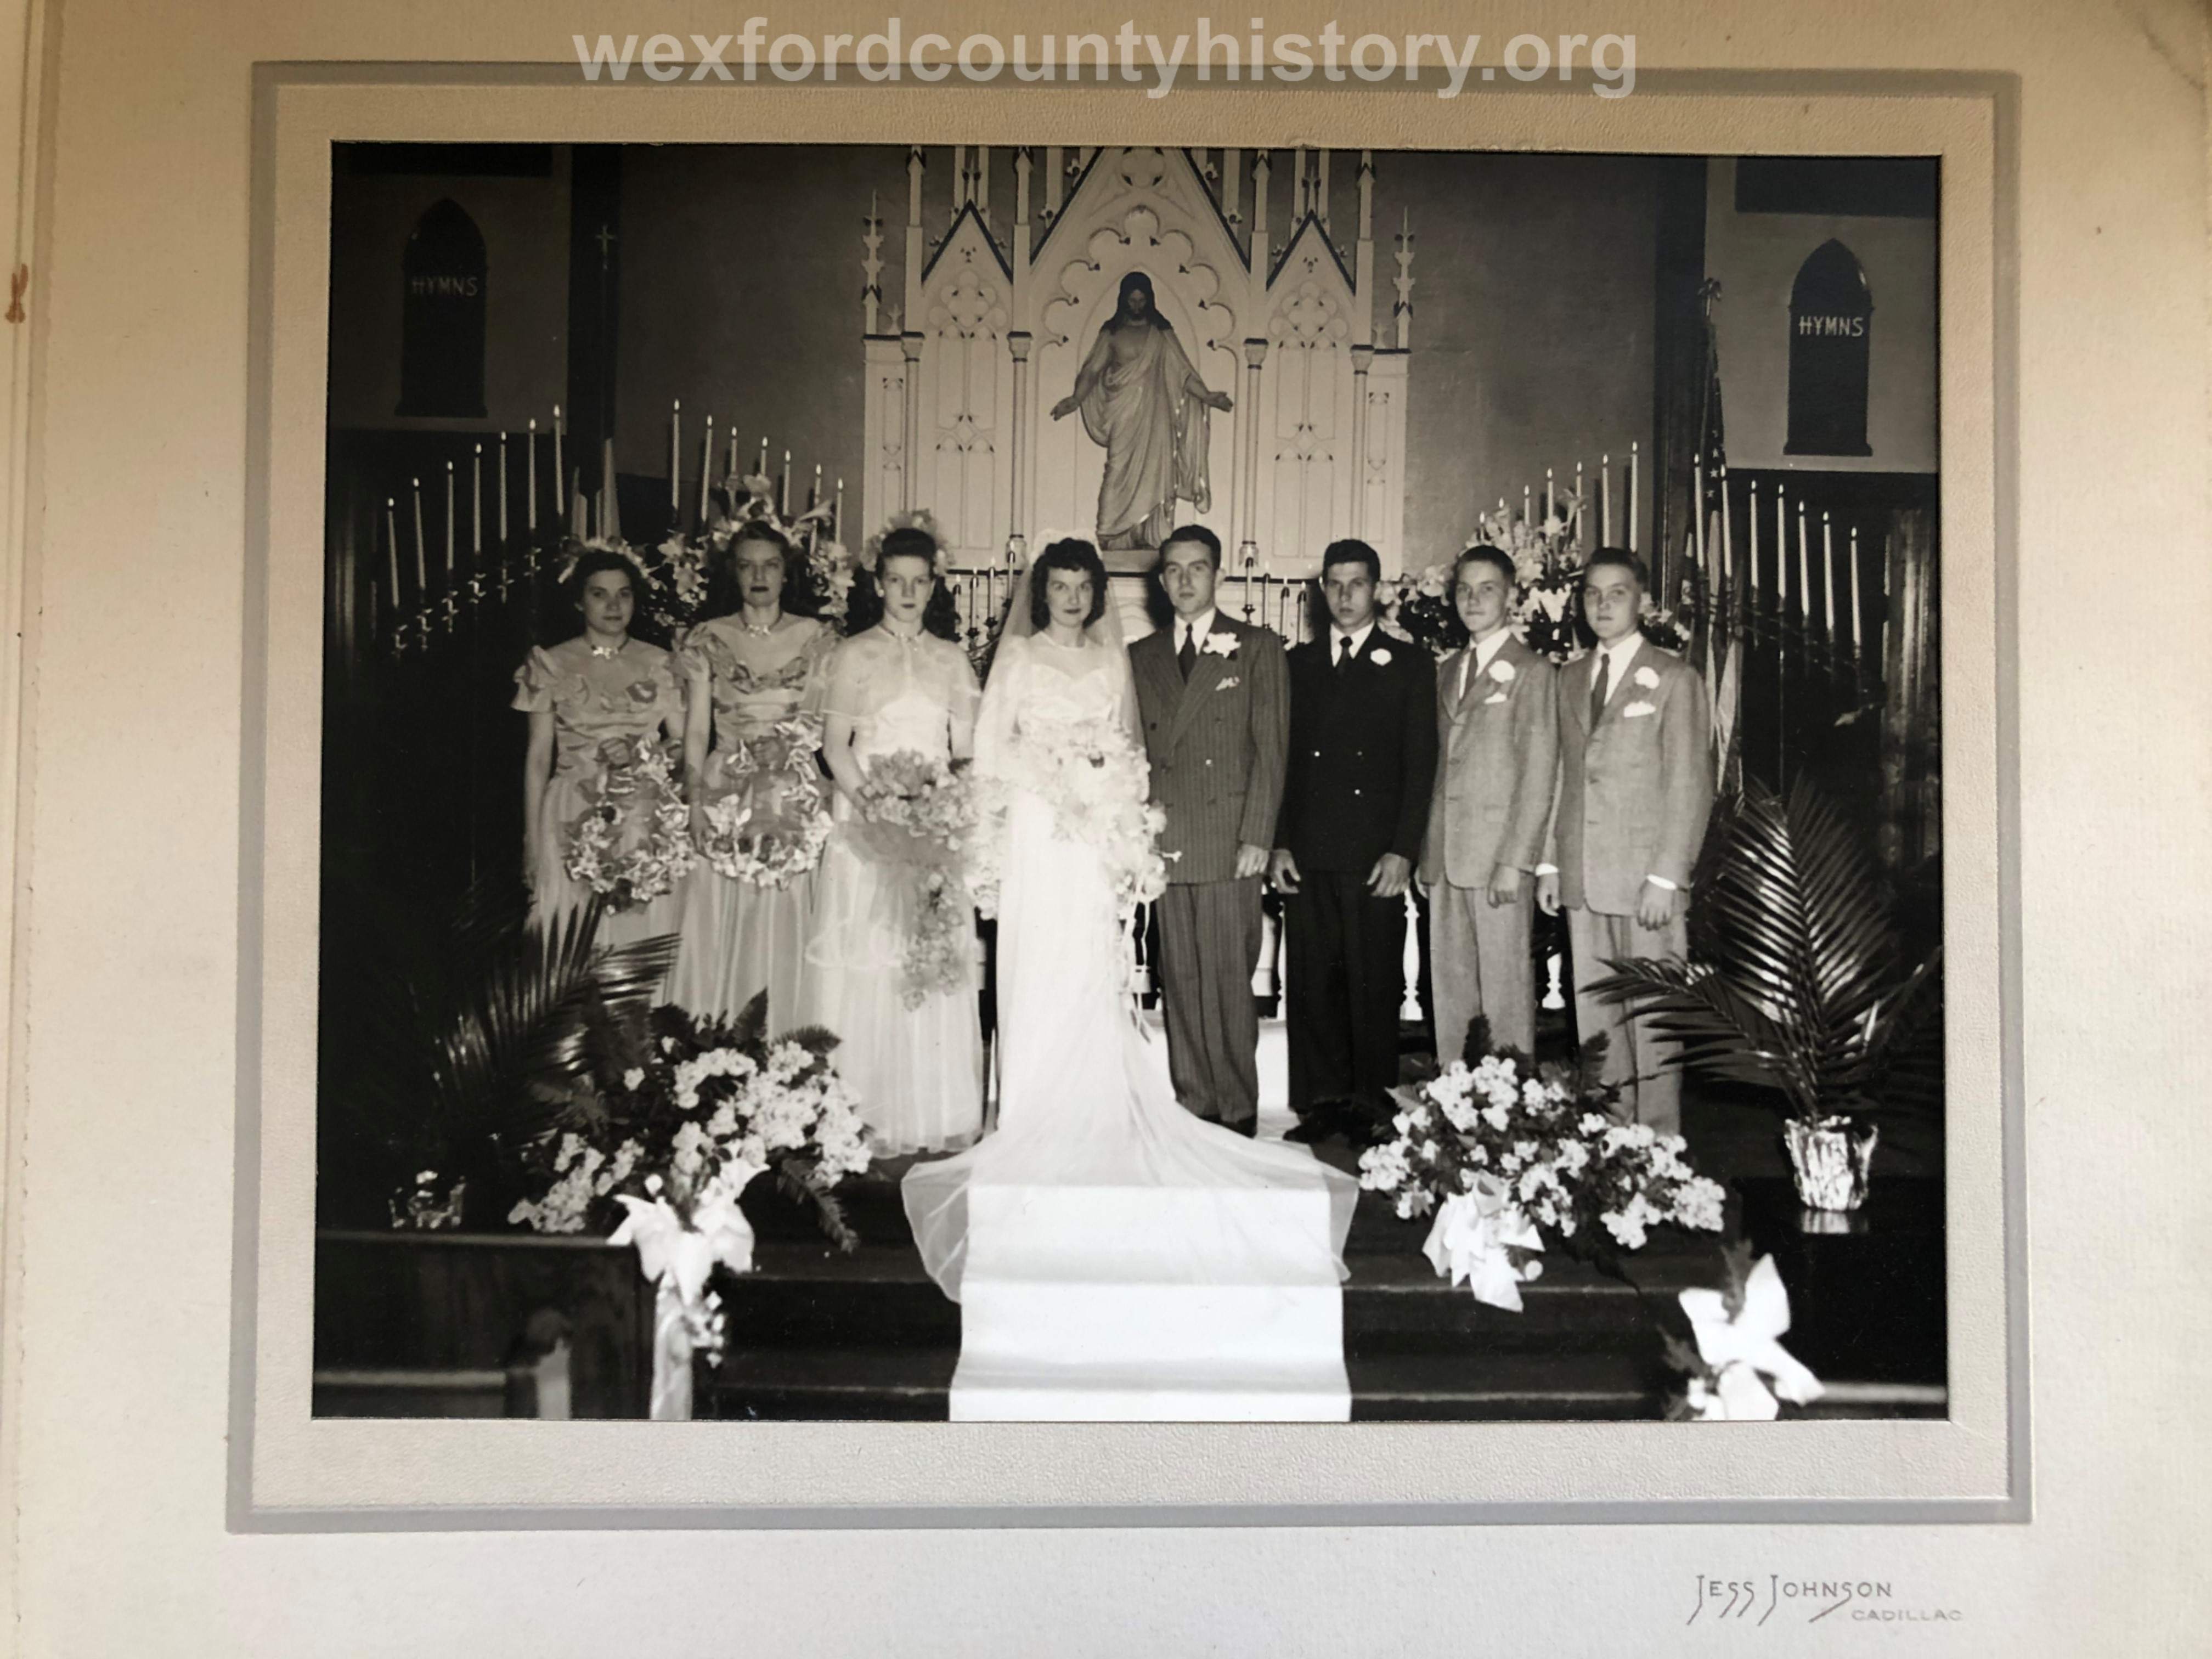 Zion Lutheran Church Wedding, 1940